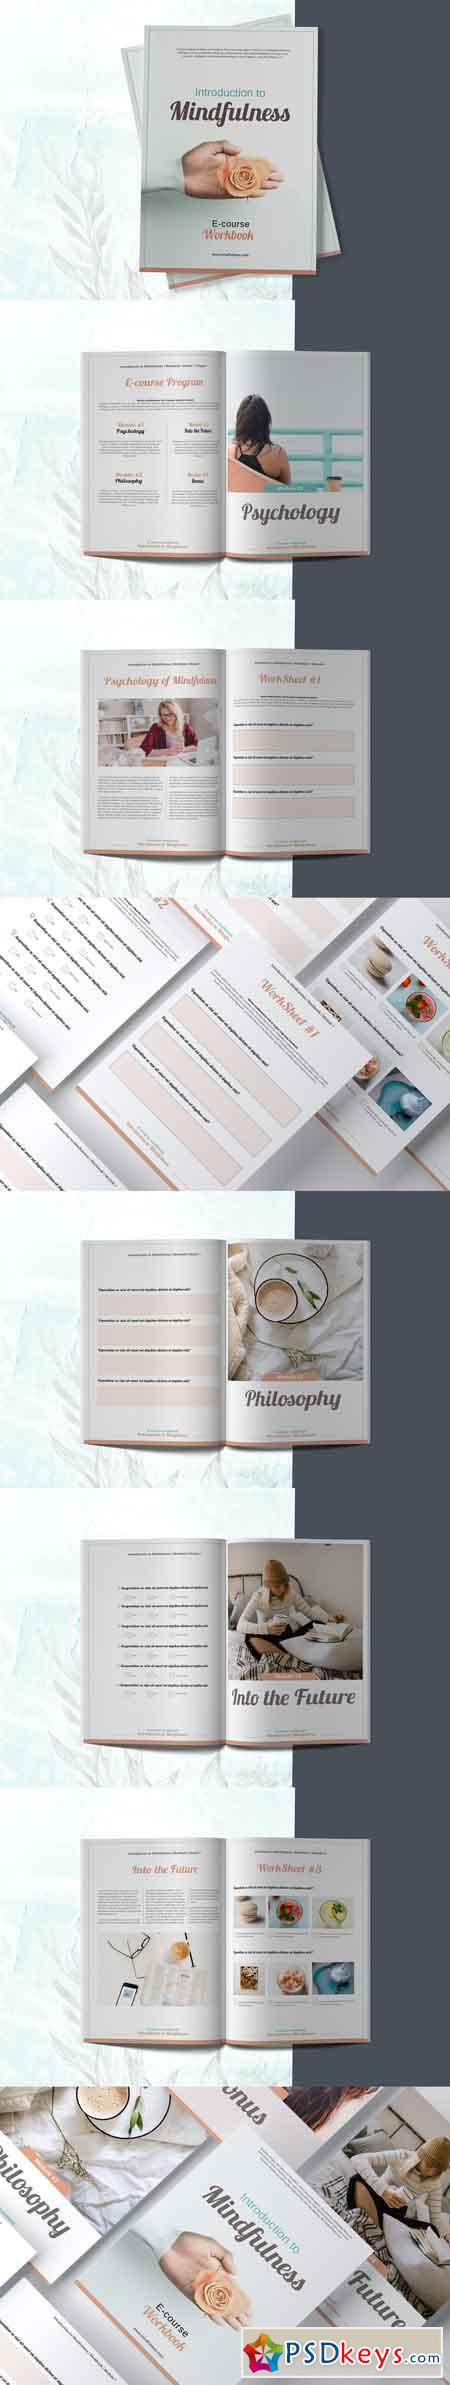 E-course Workbook Opt-in Template 3367363